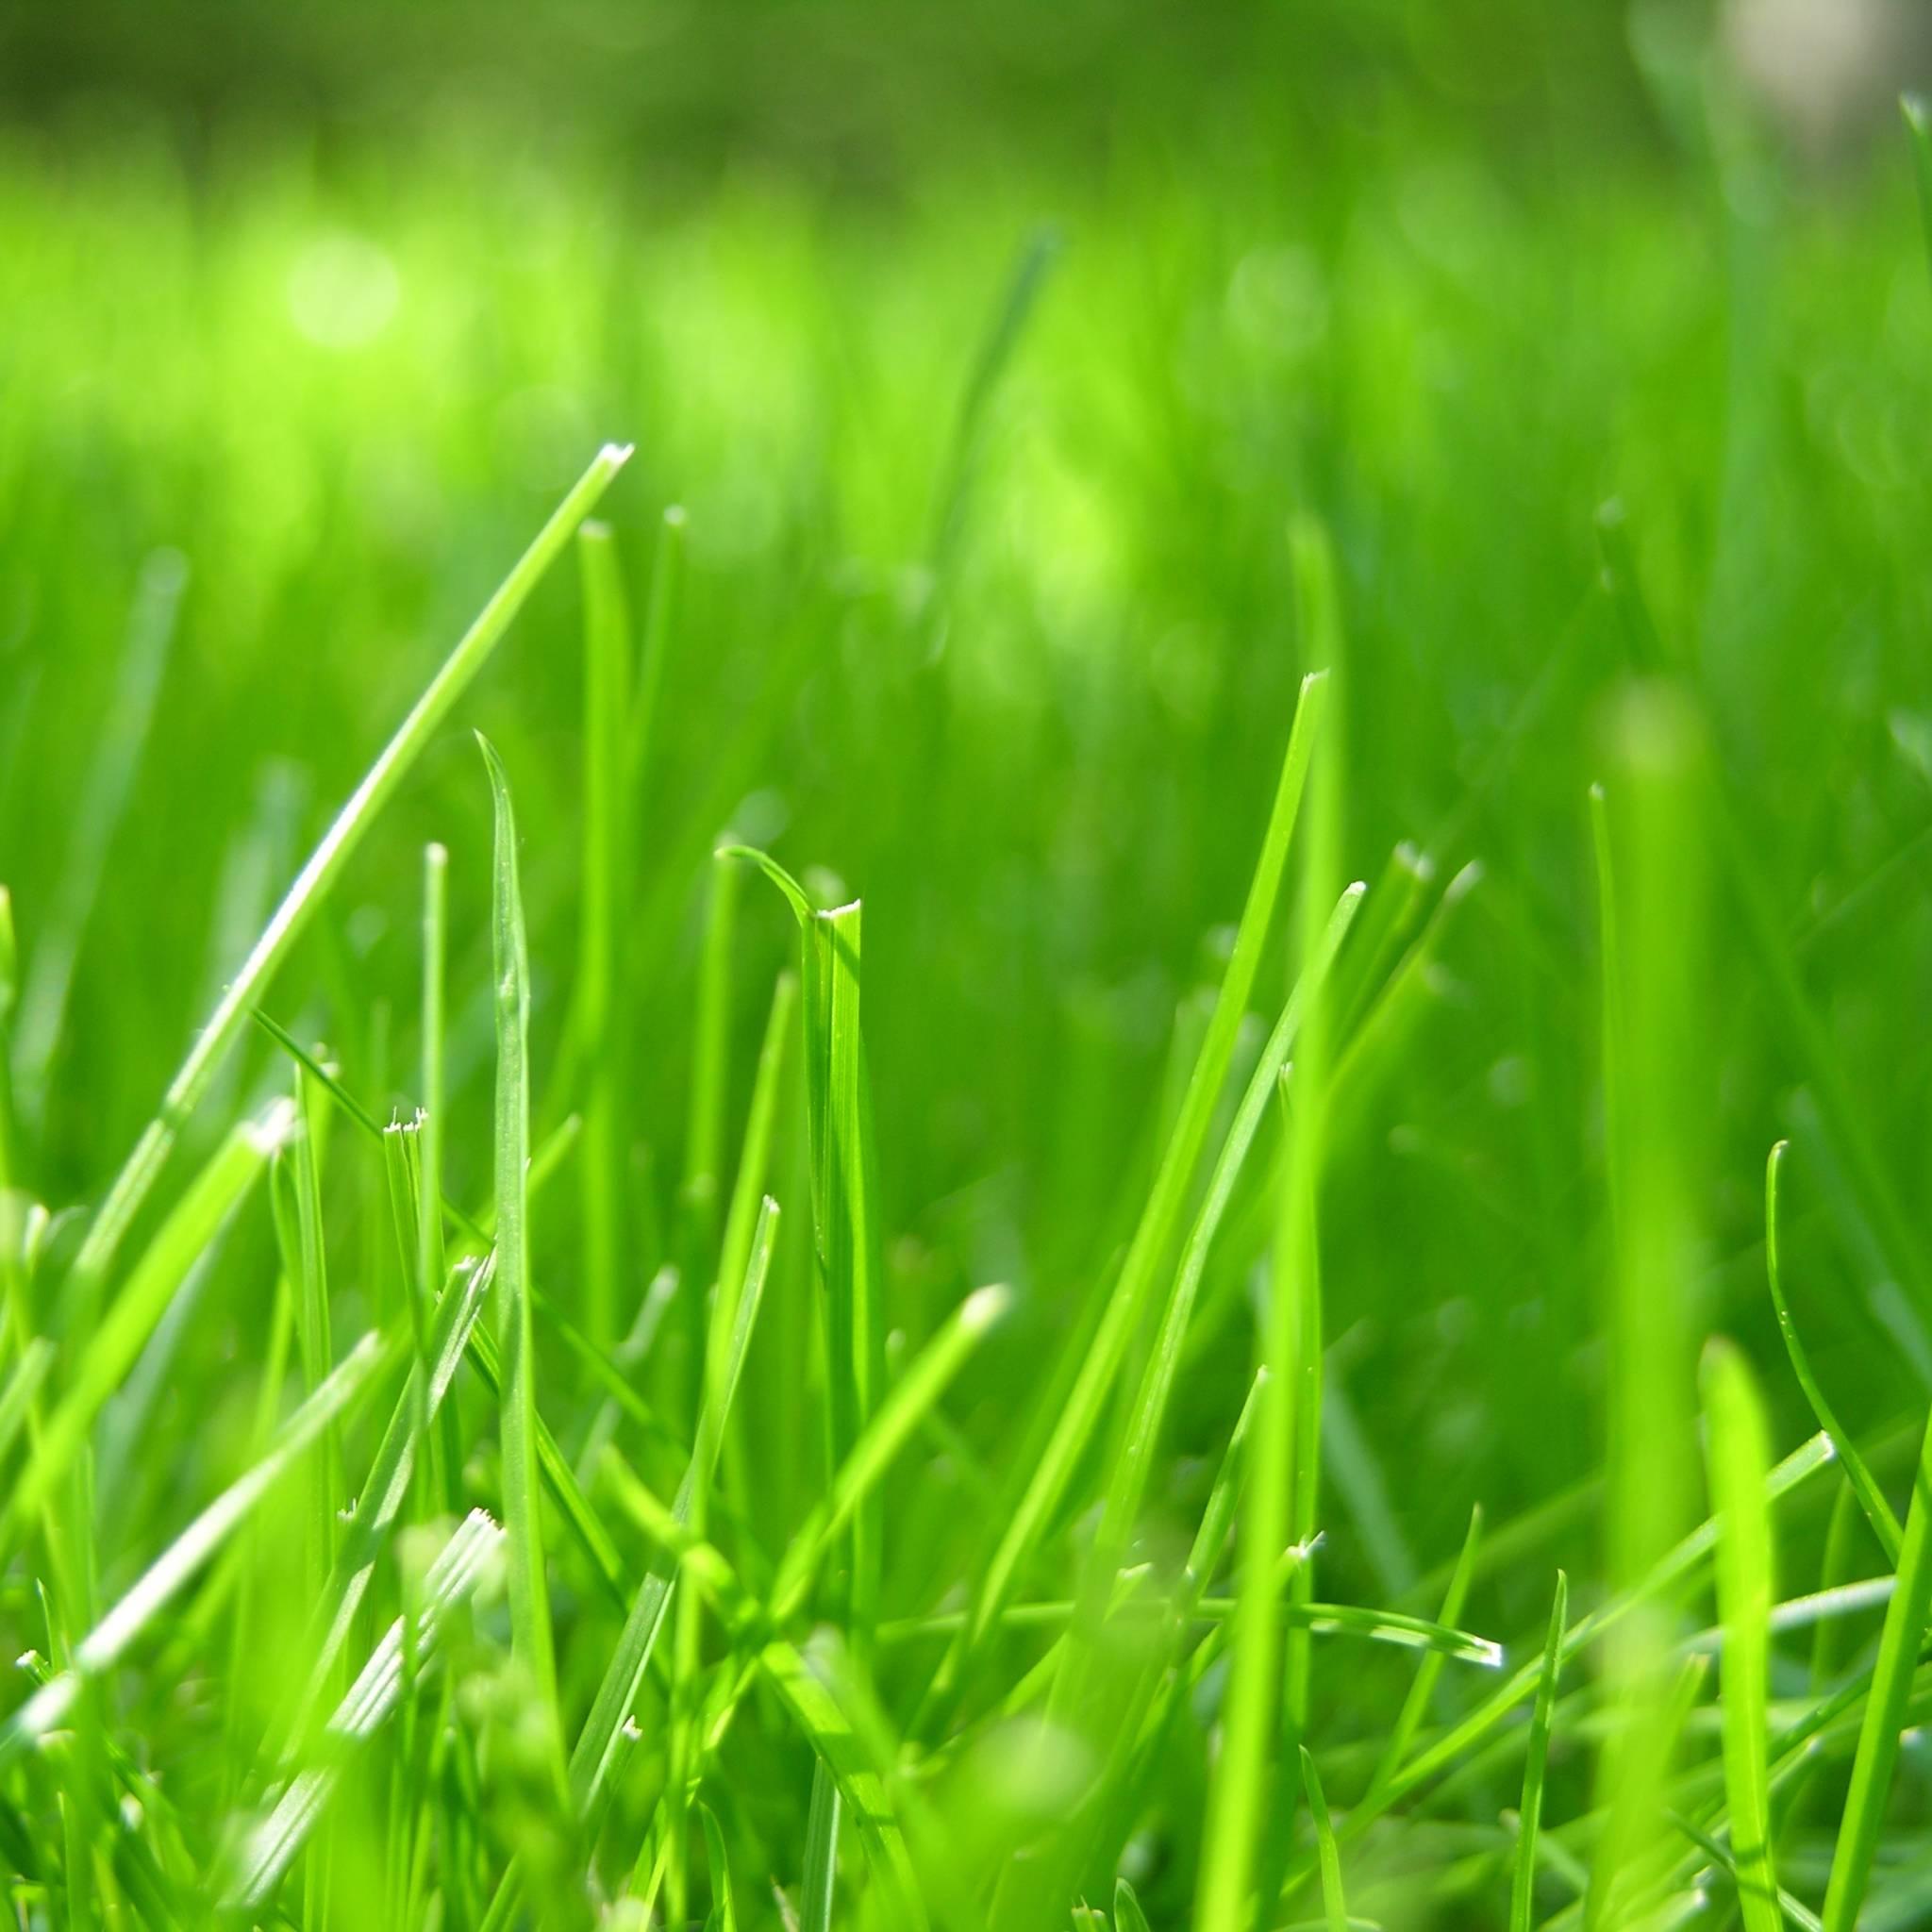 apple fruit background grass - photo #32